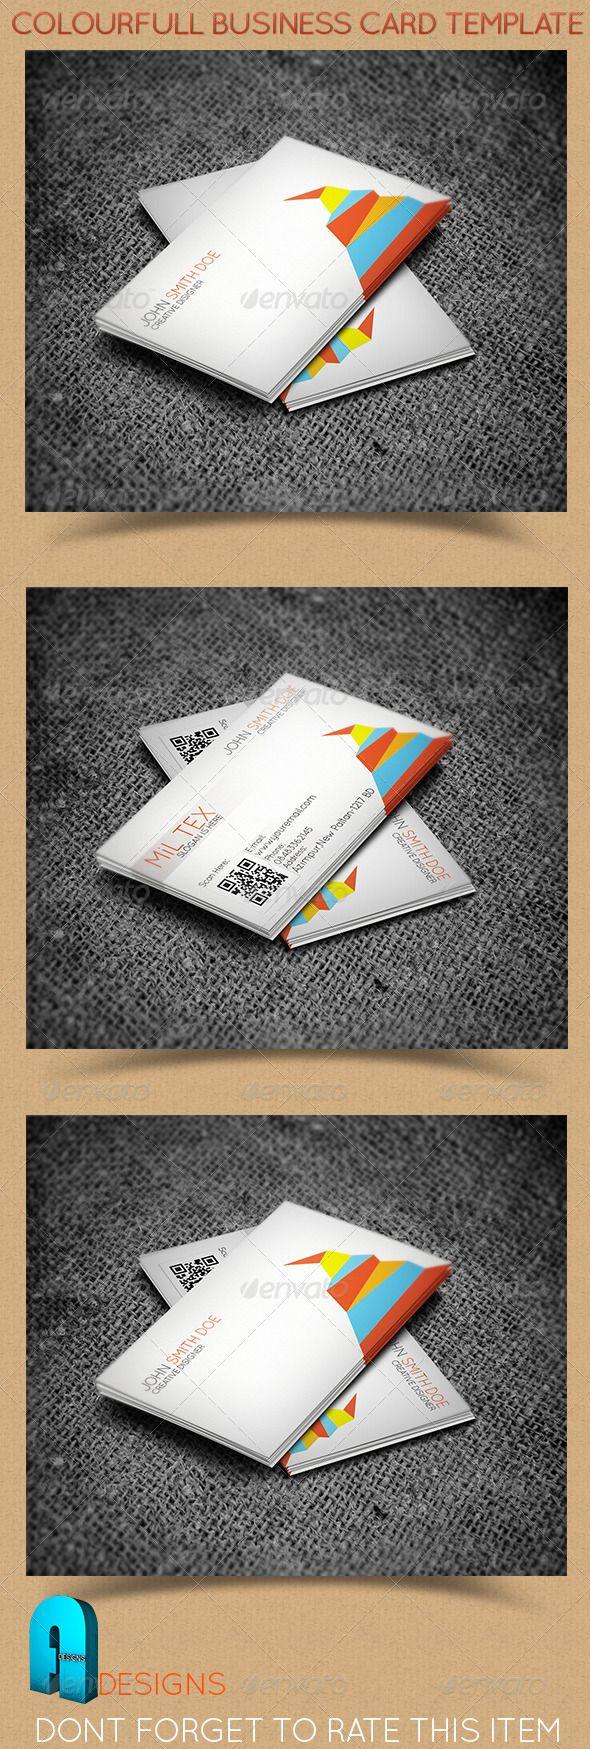 94 best Print Templates images on Pinterest | Print templates, Flyer ...